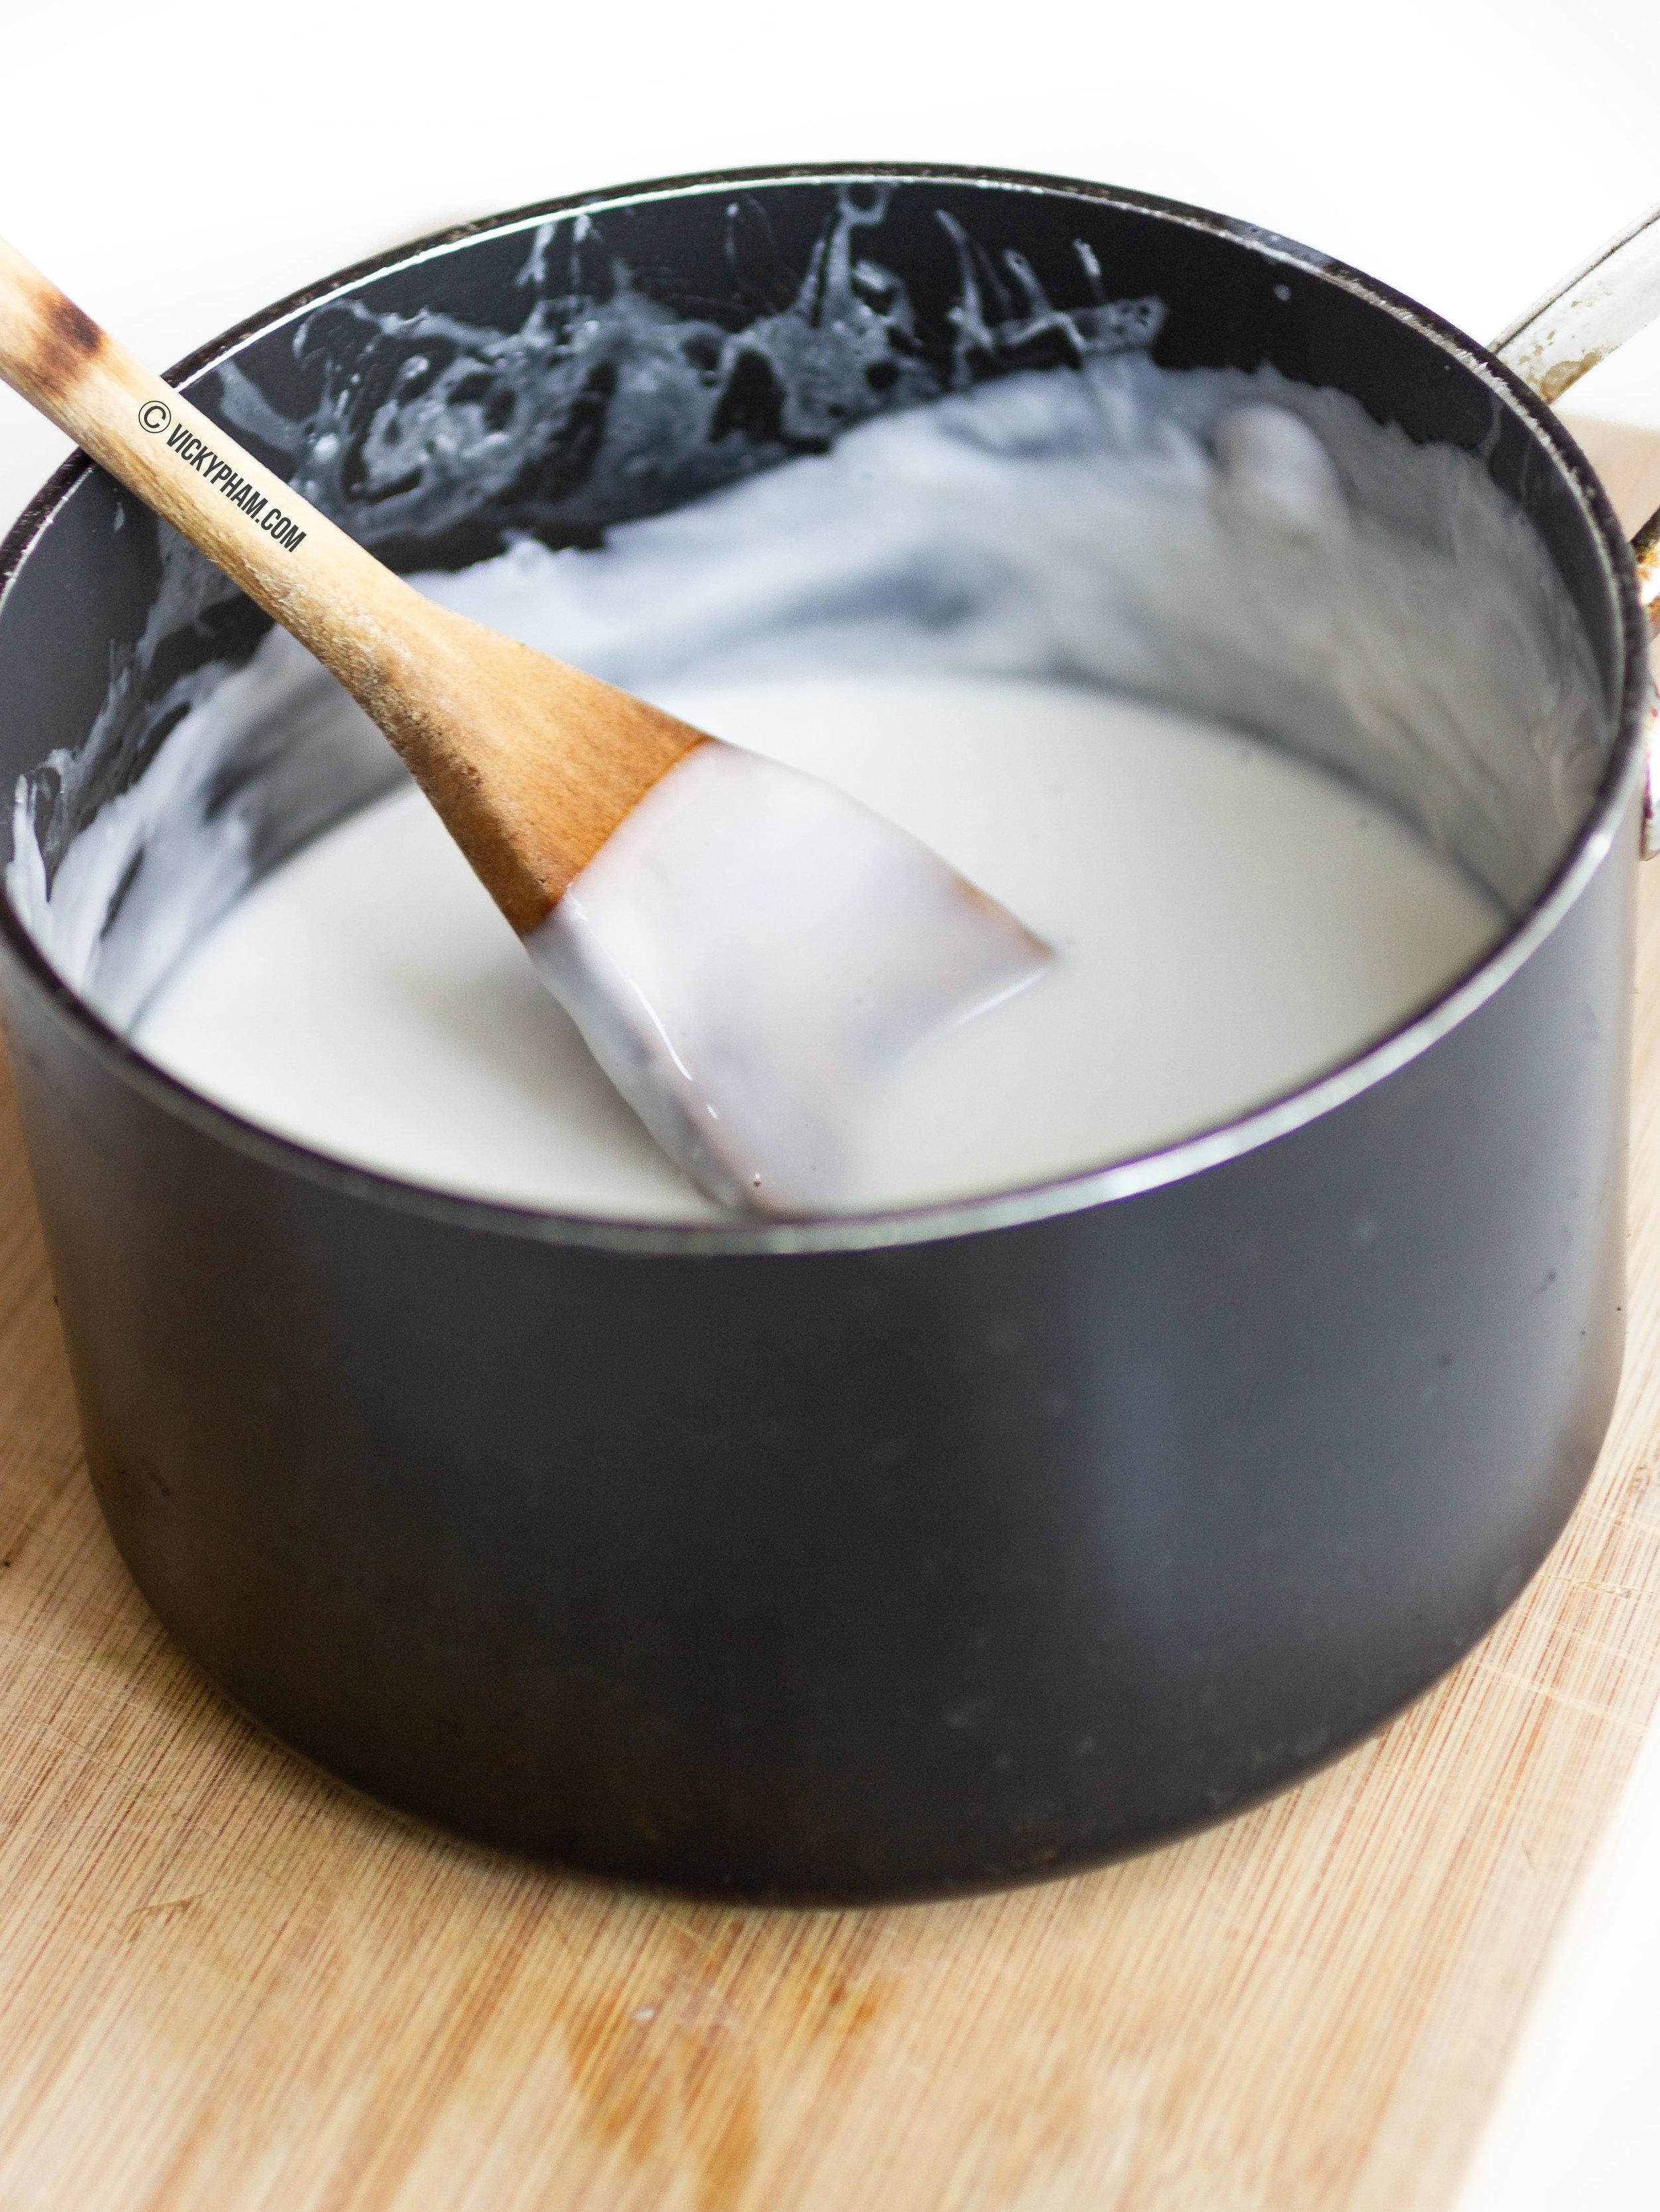 Sweetened Coconut Milk Sauce for Asian Desserts (Nuoc Cot Dua)